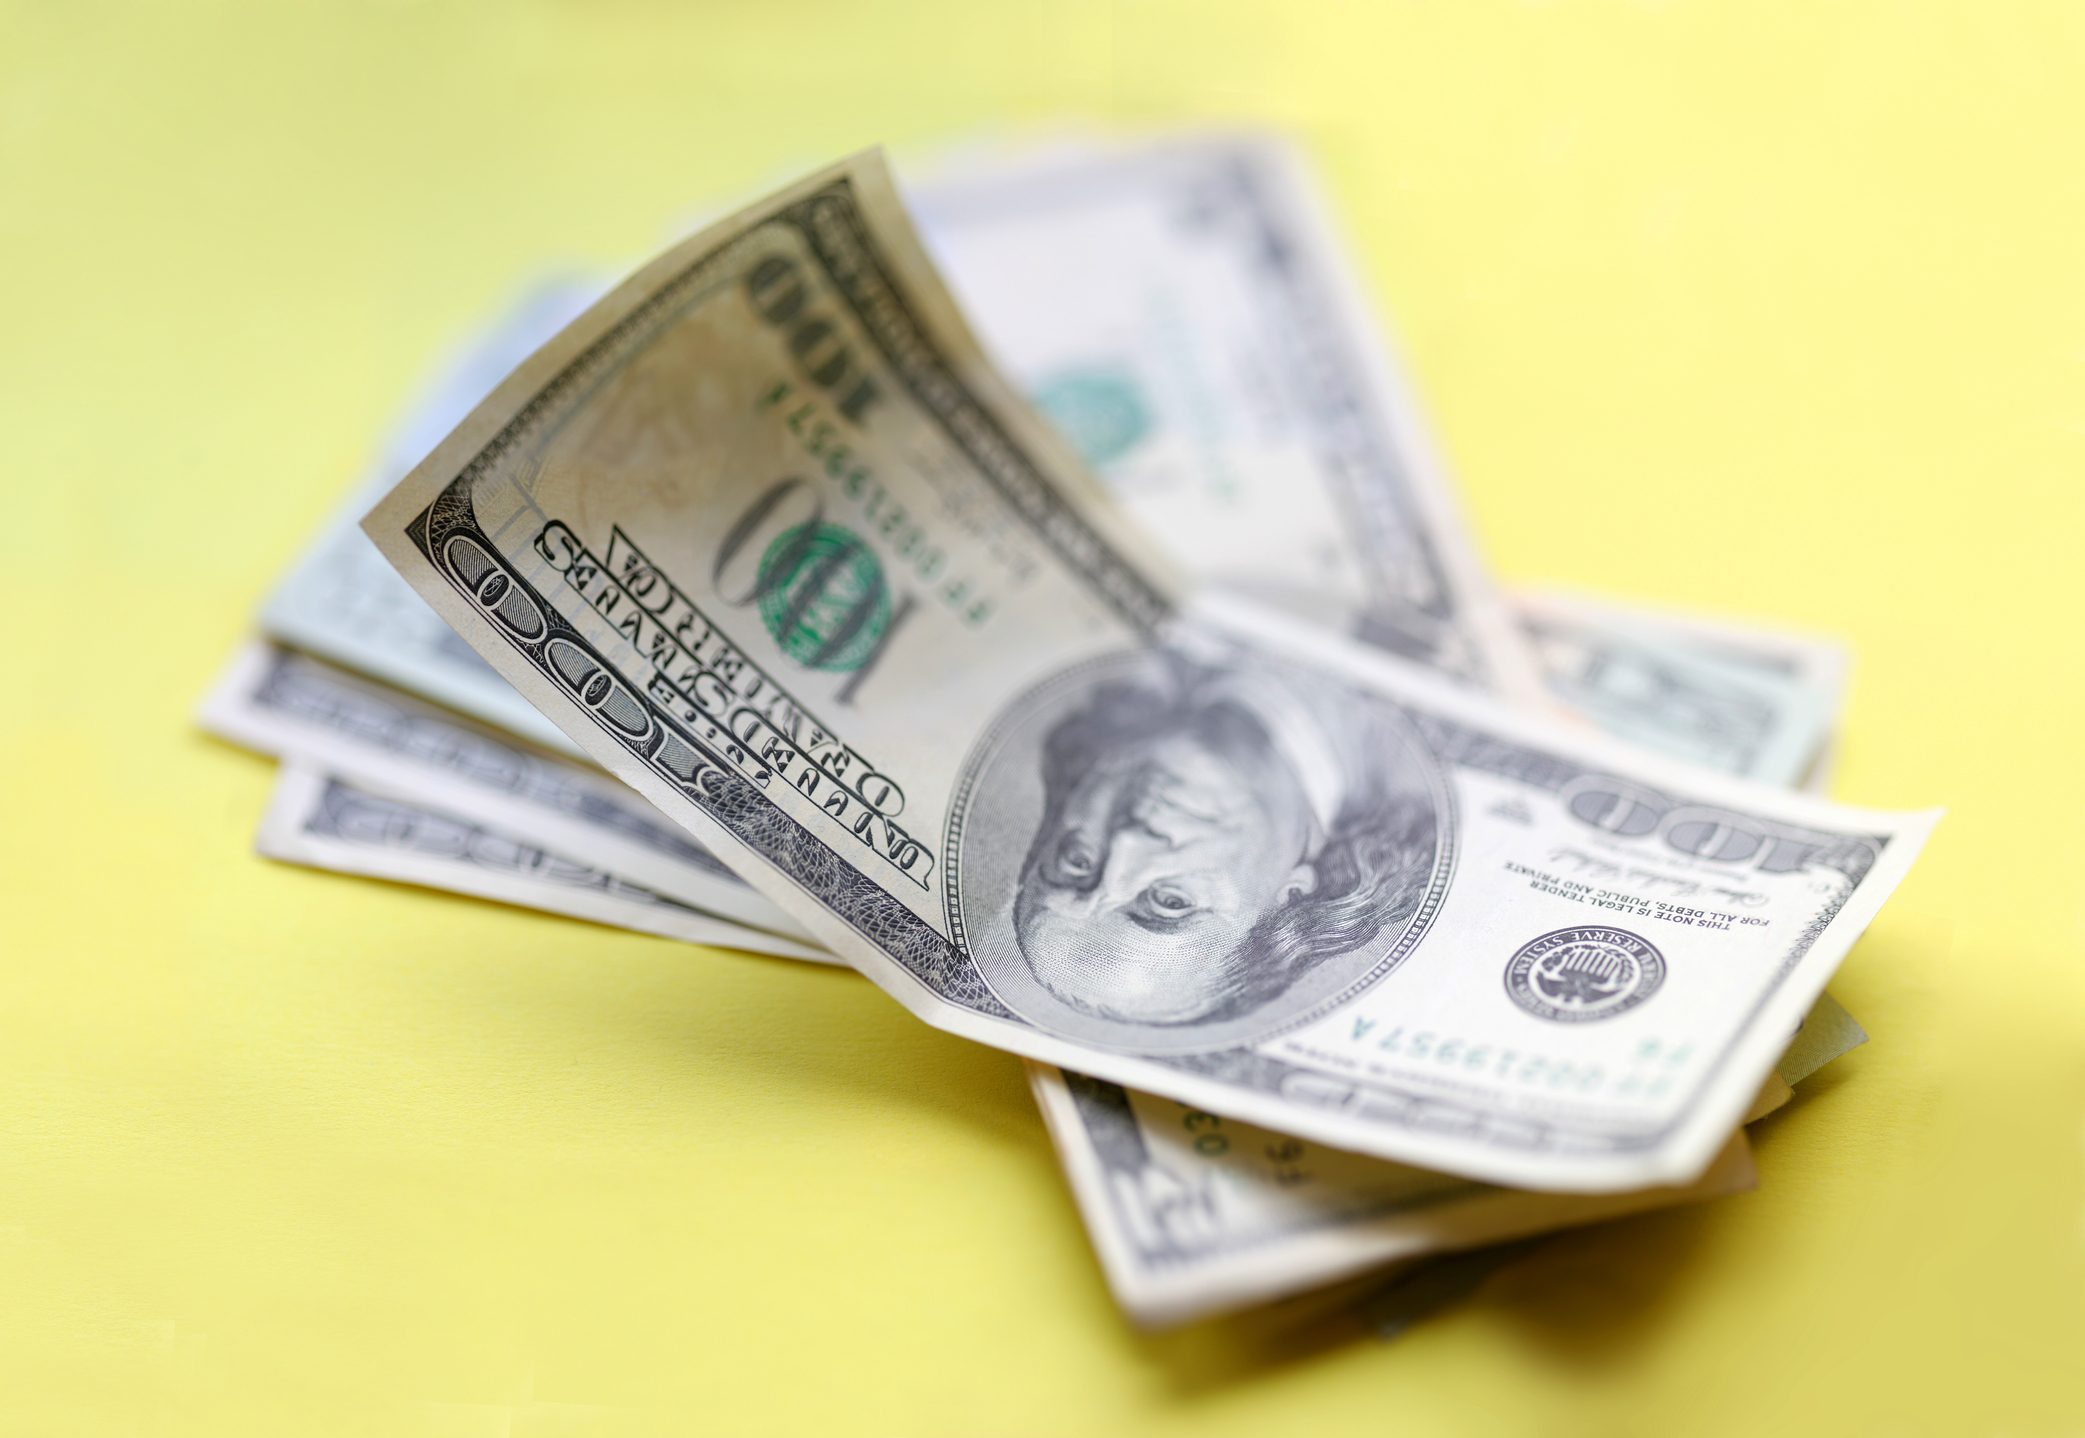 Dollars. Some piece of money.